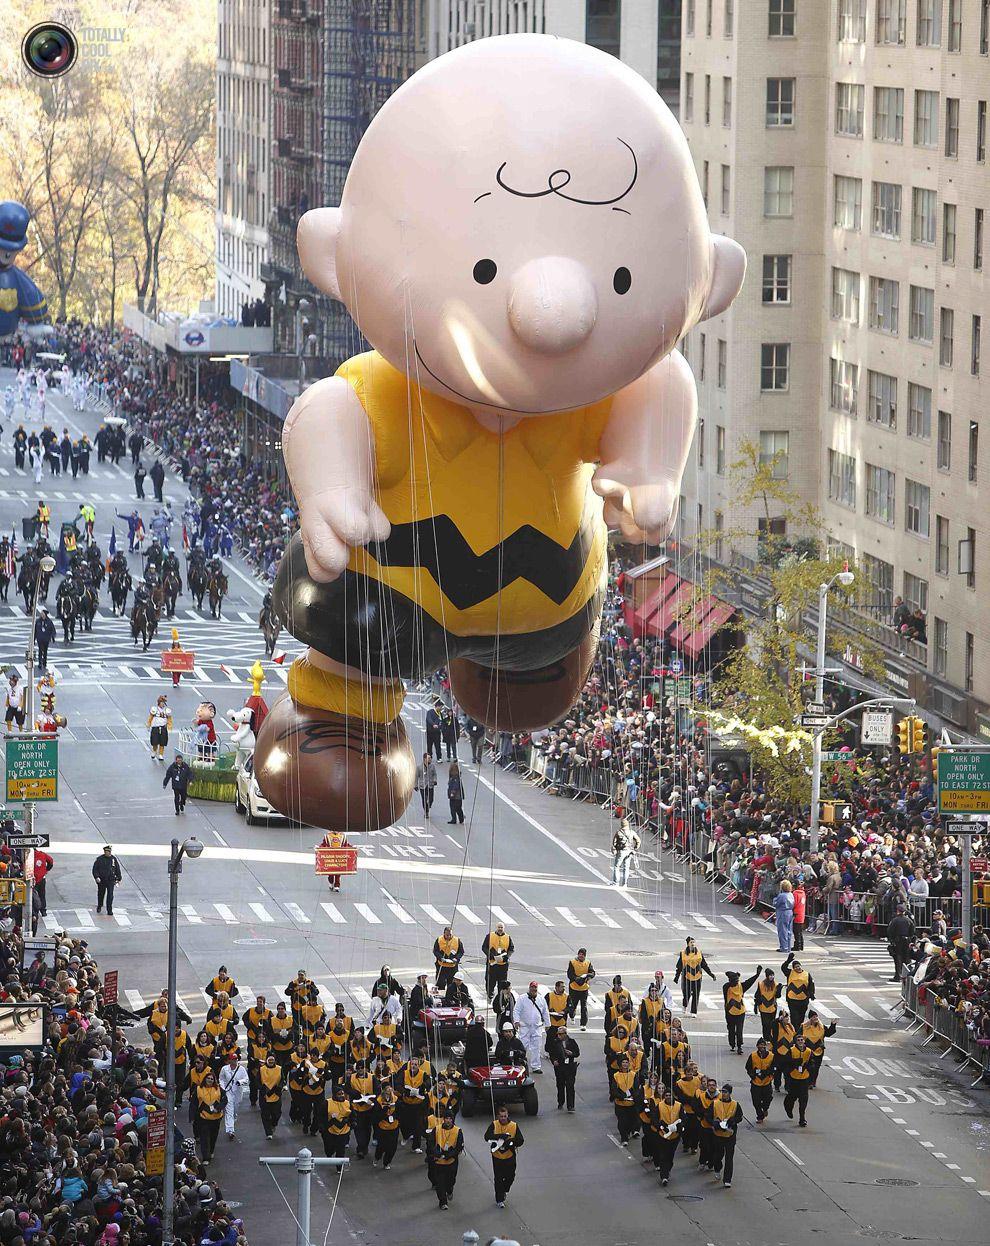 Macys Balloons Clowns Gather As The Sun Rises Over The Macy S Thanksgiving D Macy S Thanksgiving Day Parade Thanksgiving Day Parade Macys Thanksgiving Parade